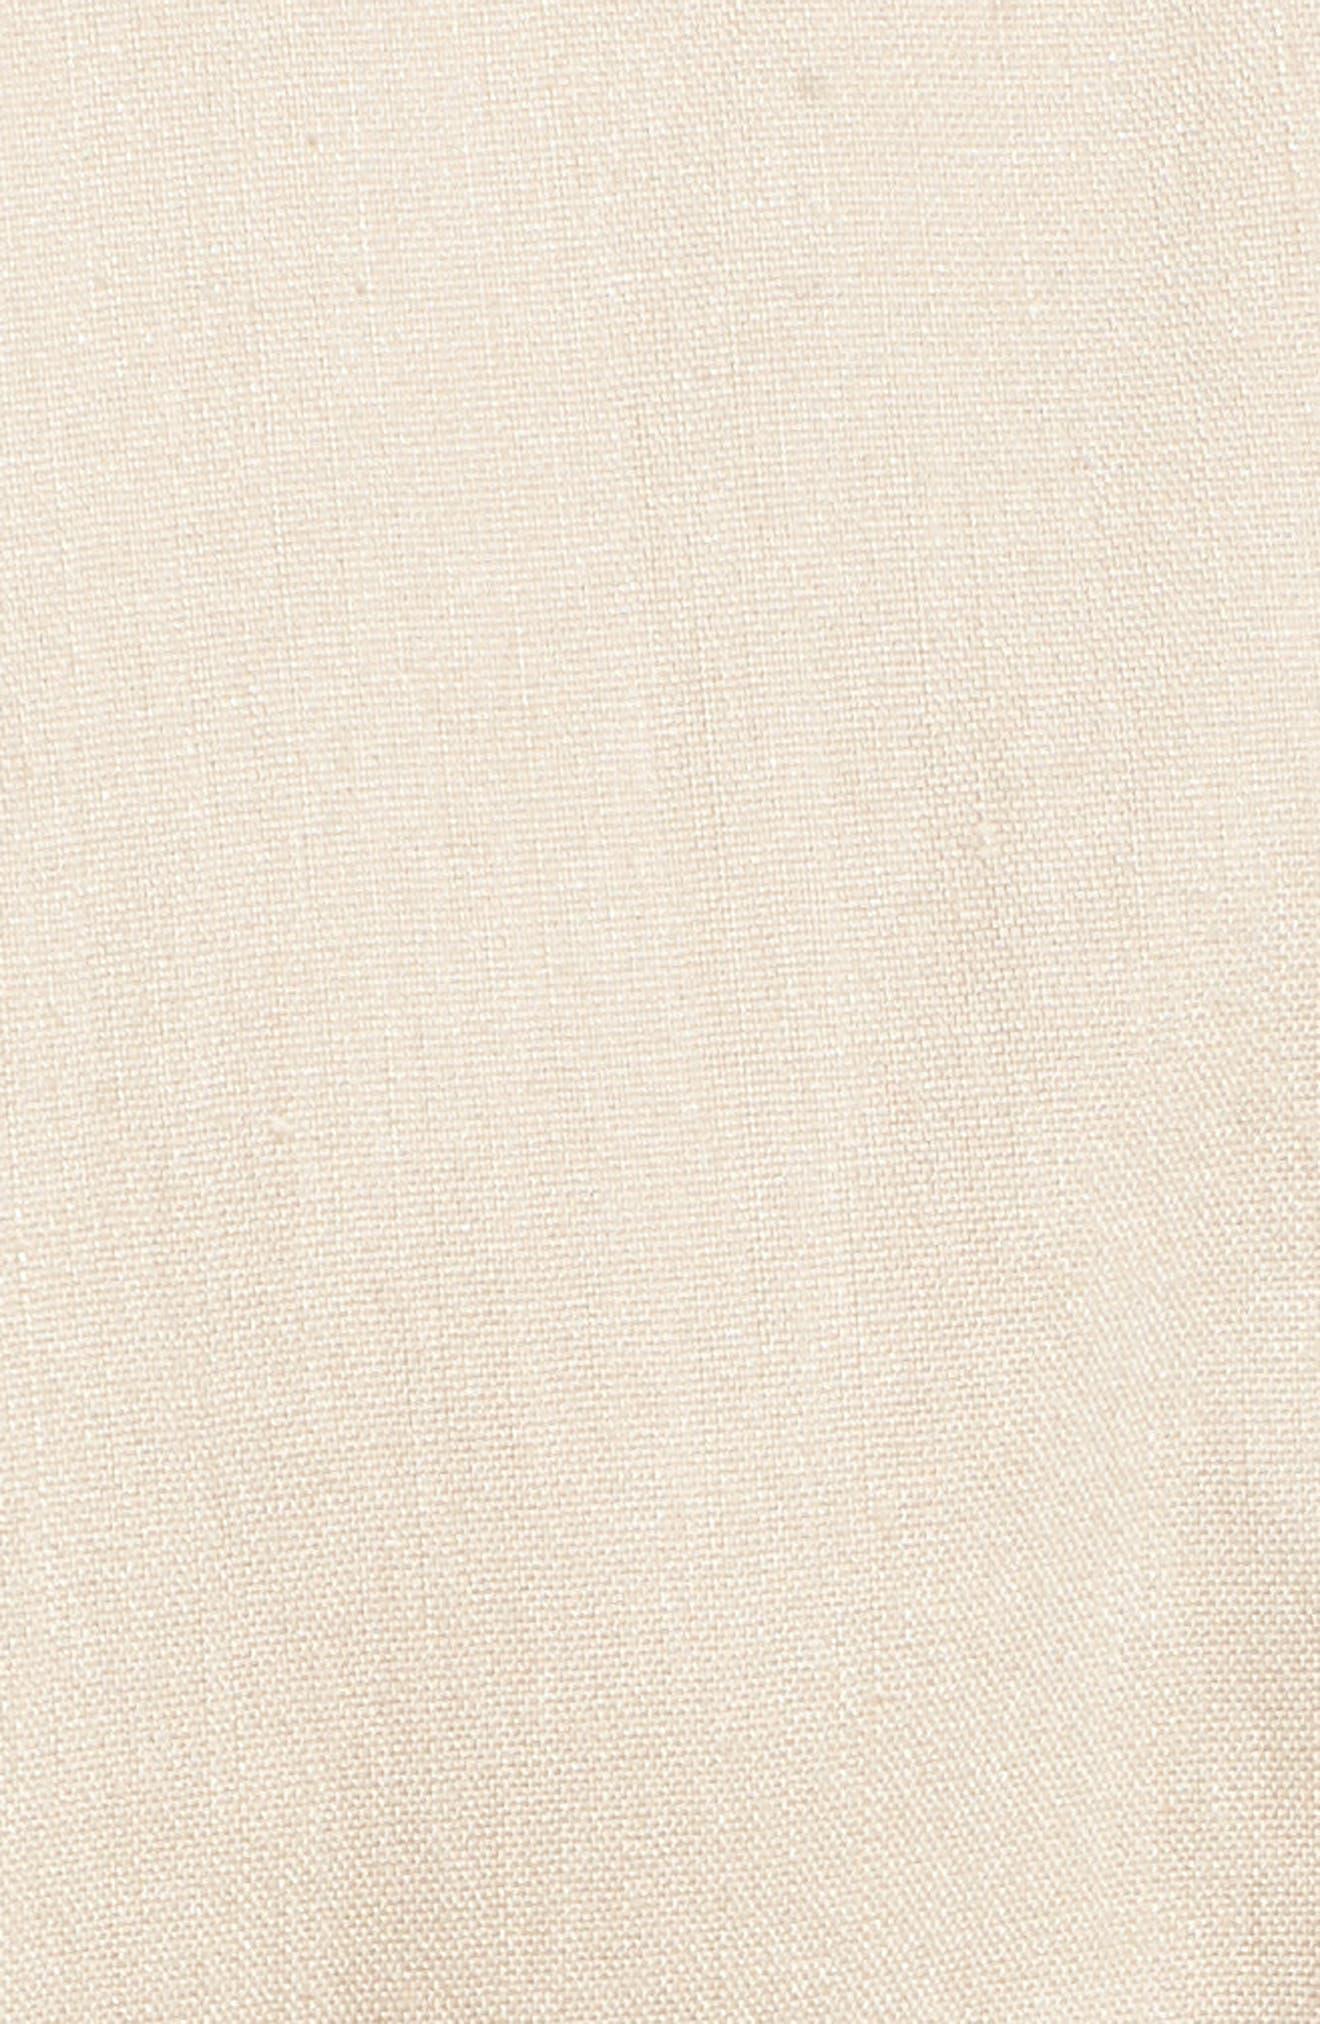 Double Breasted Linen Blend Blazer,                             Alternate thumbnail 28, color,